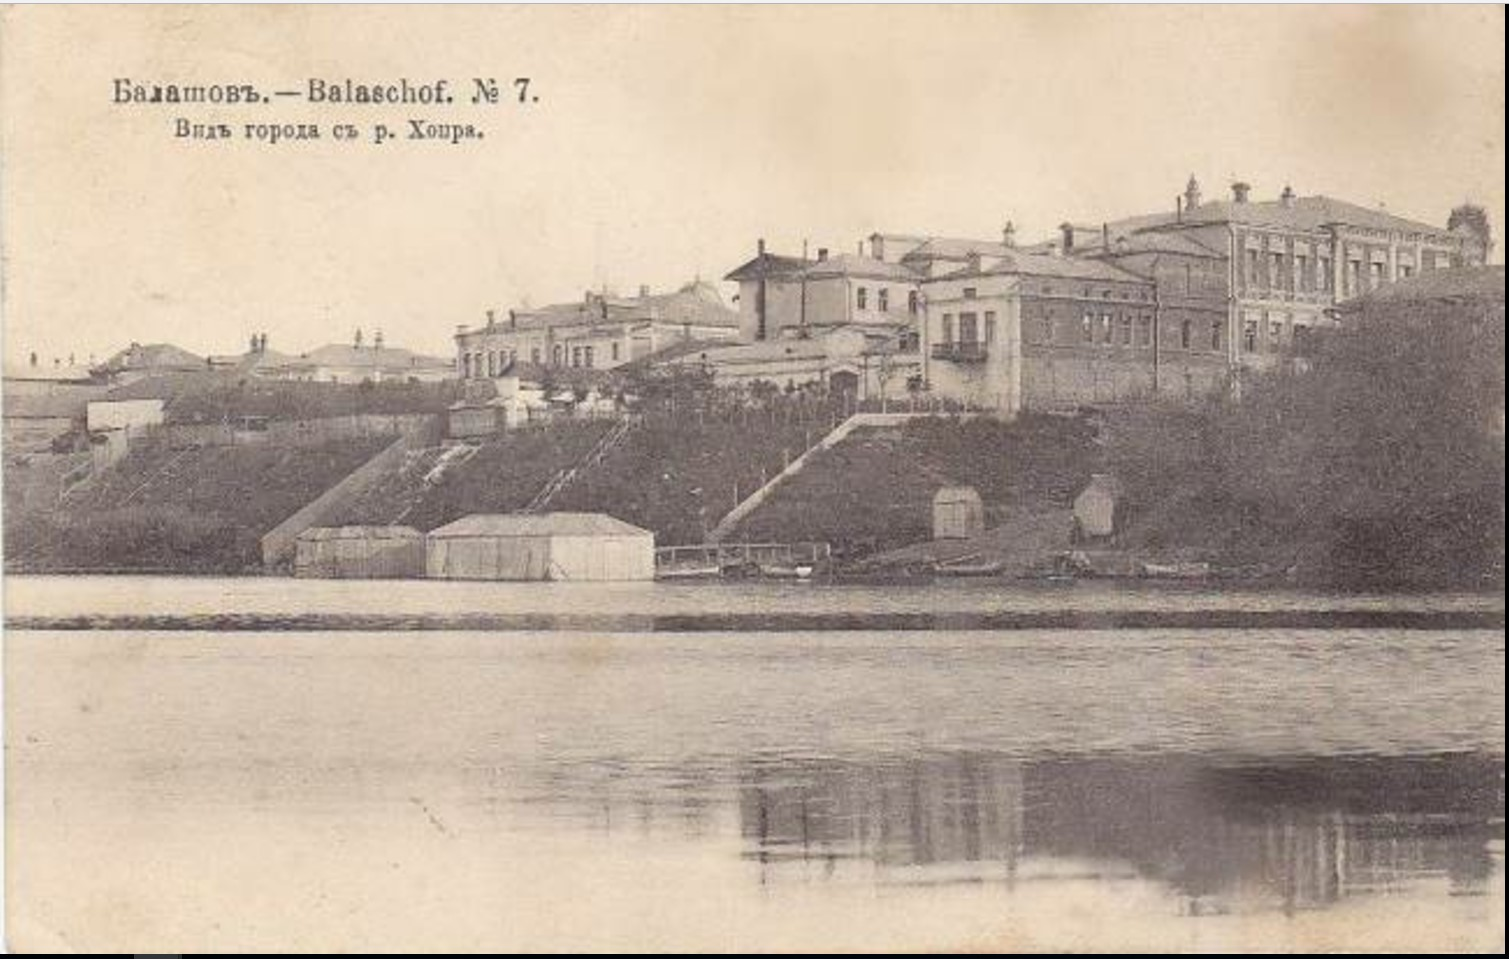 Вид города с реки Хопр